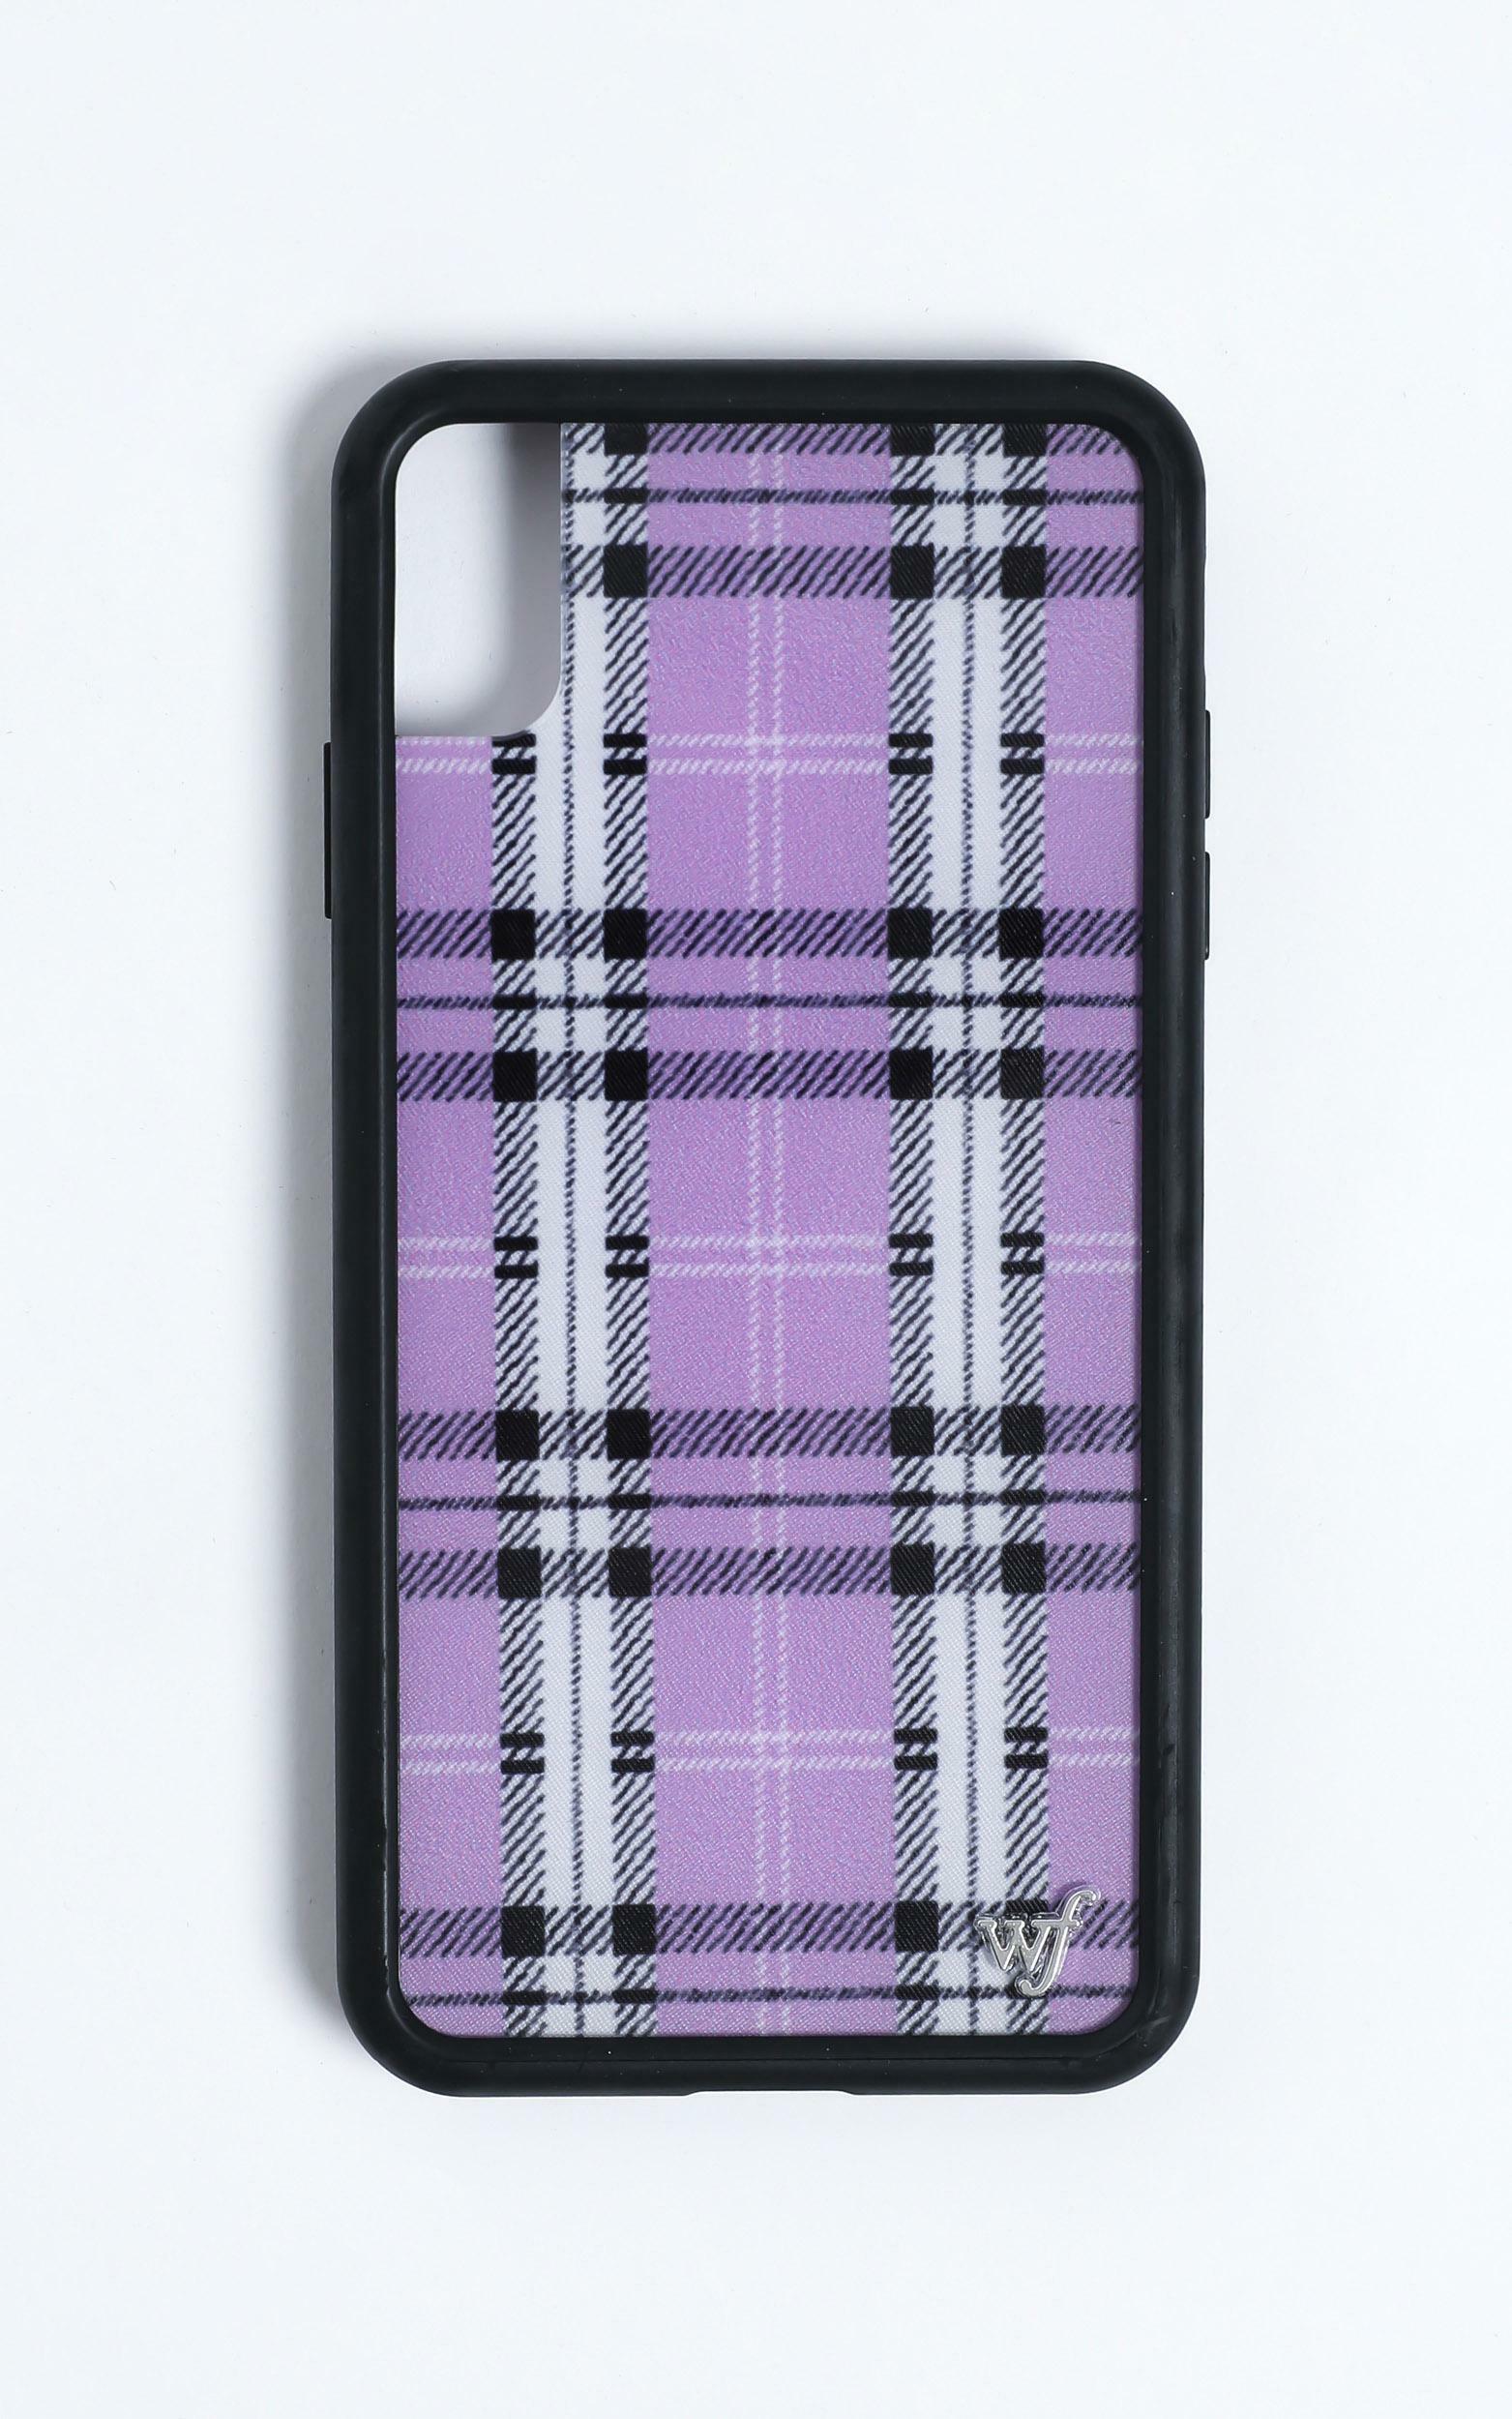 Wildflower - Iphone Case in Lavender Plaid - 8, Purple, hi-res image number null